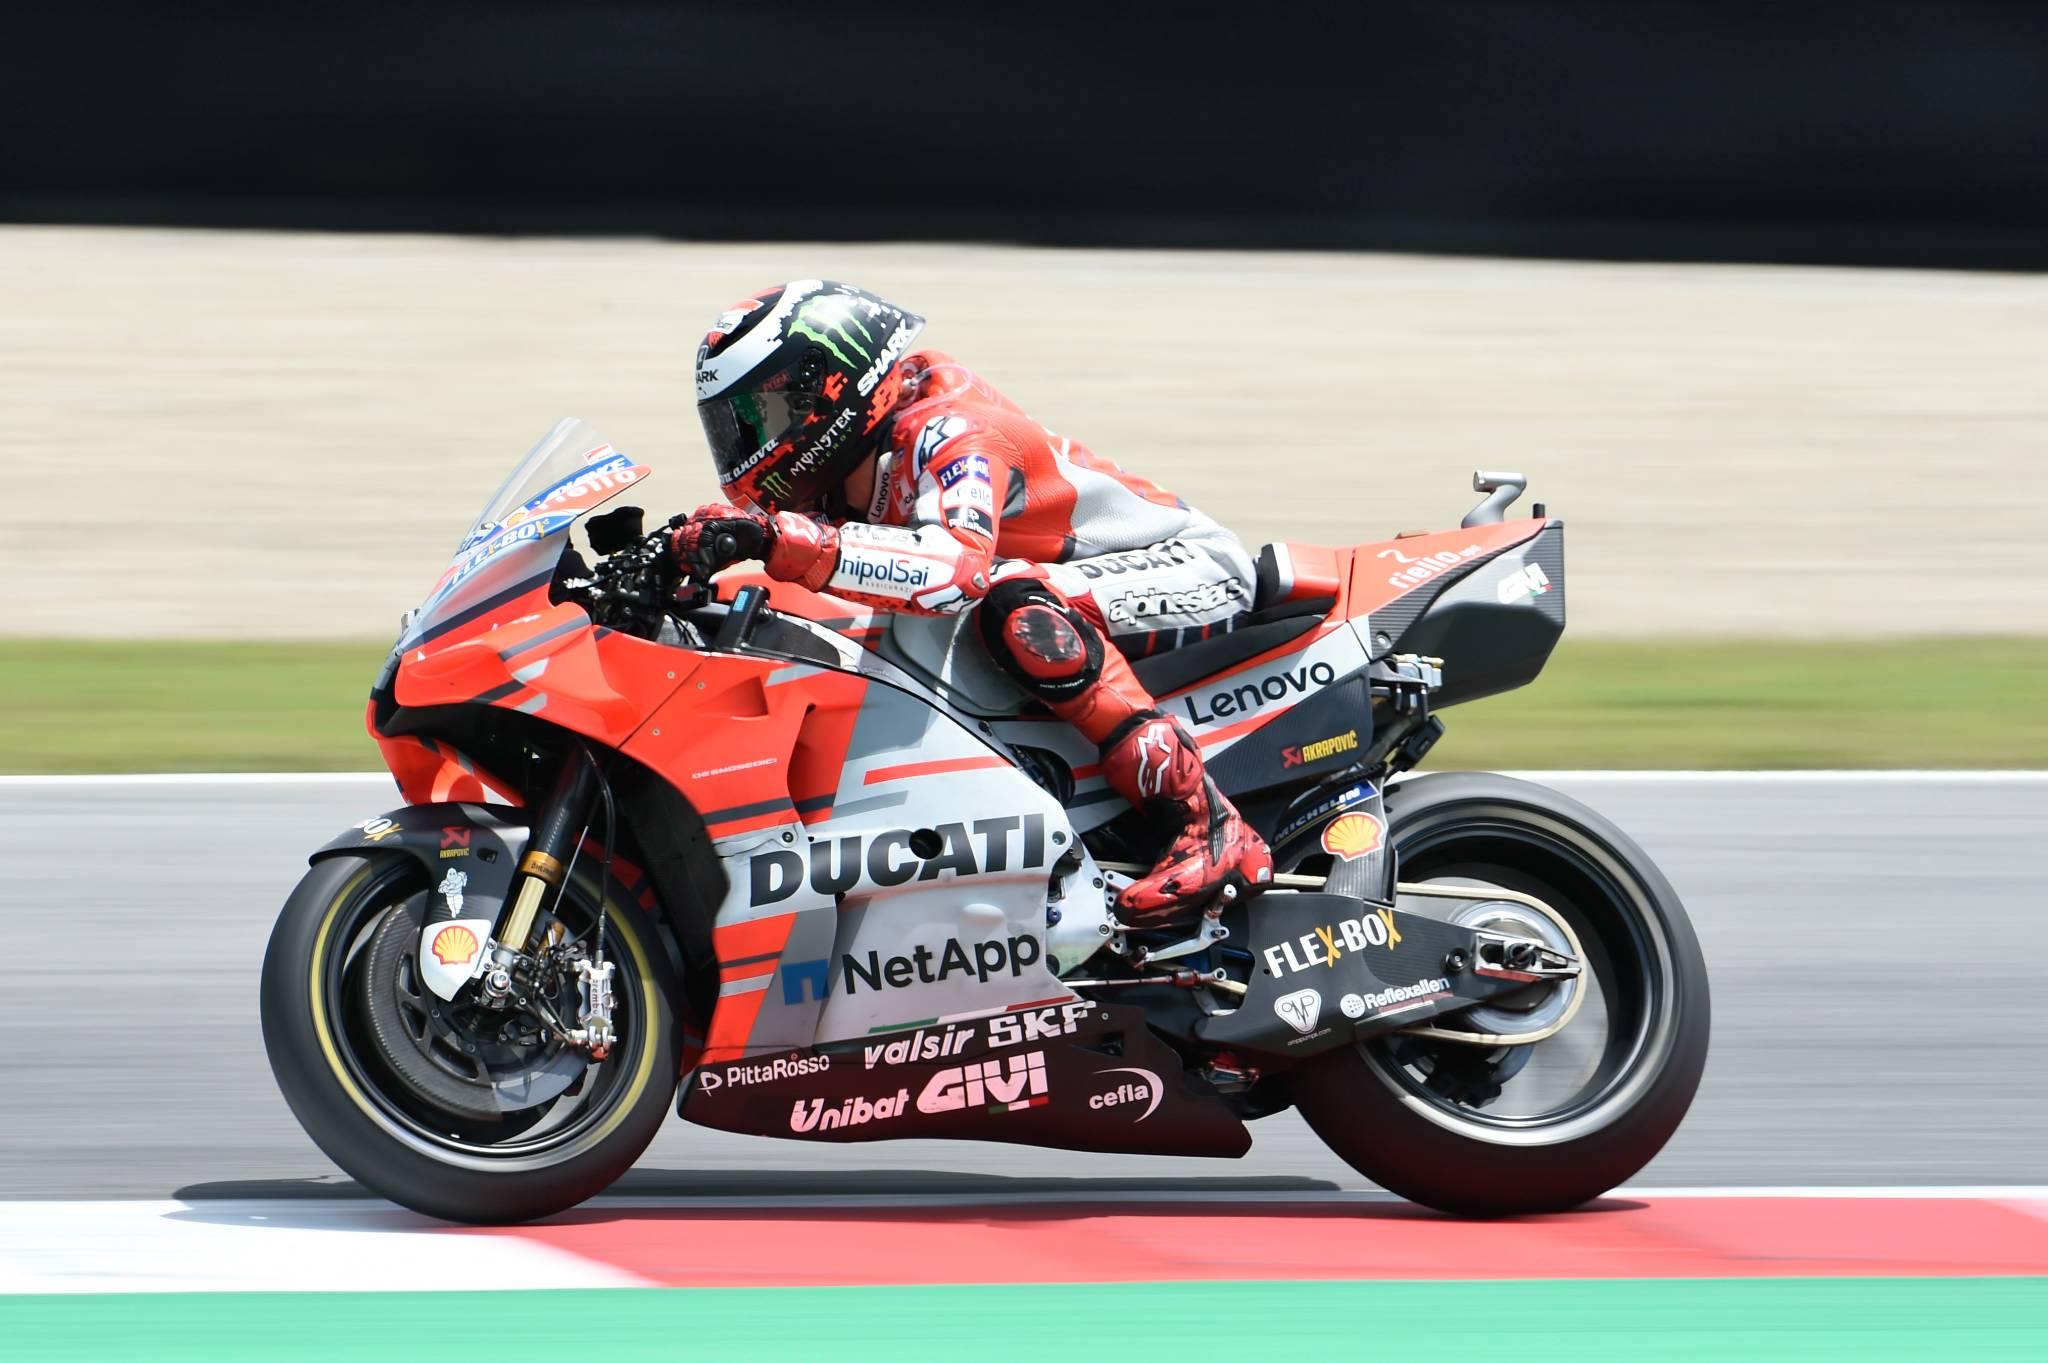 MotoGP 2018 2018 Italian MotoGP Race Results Results